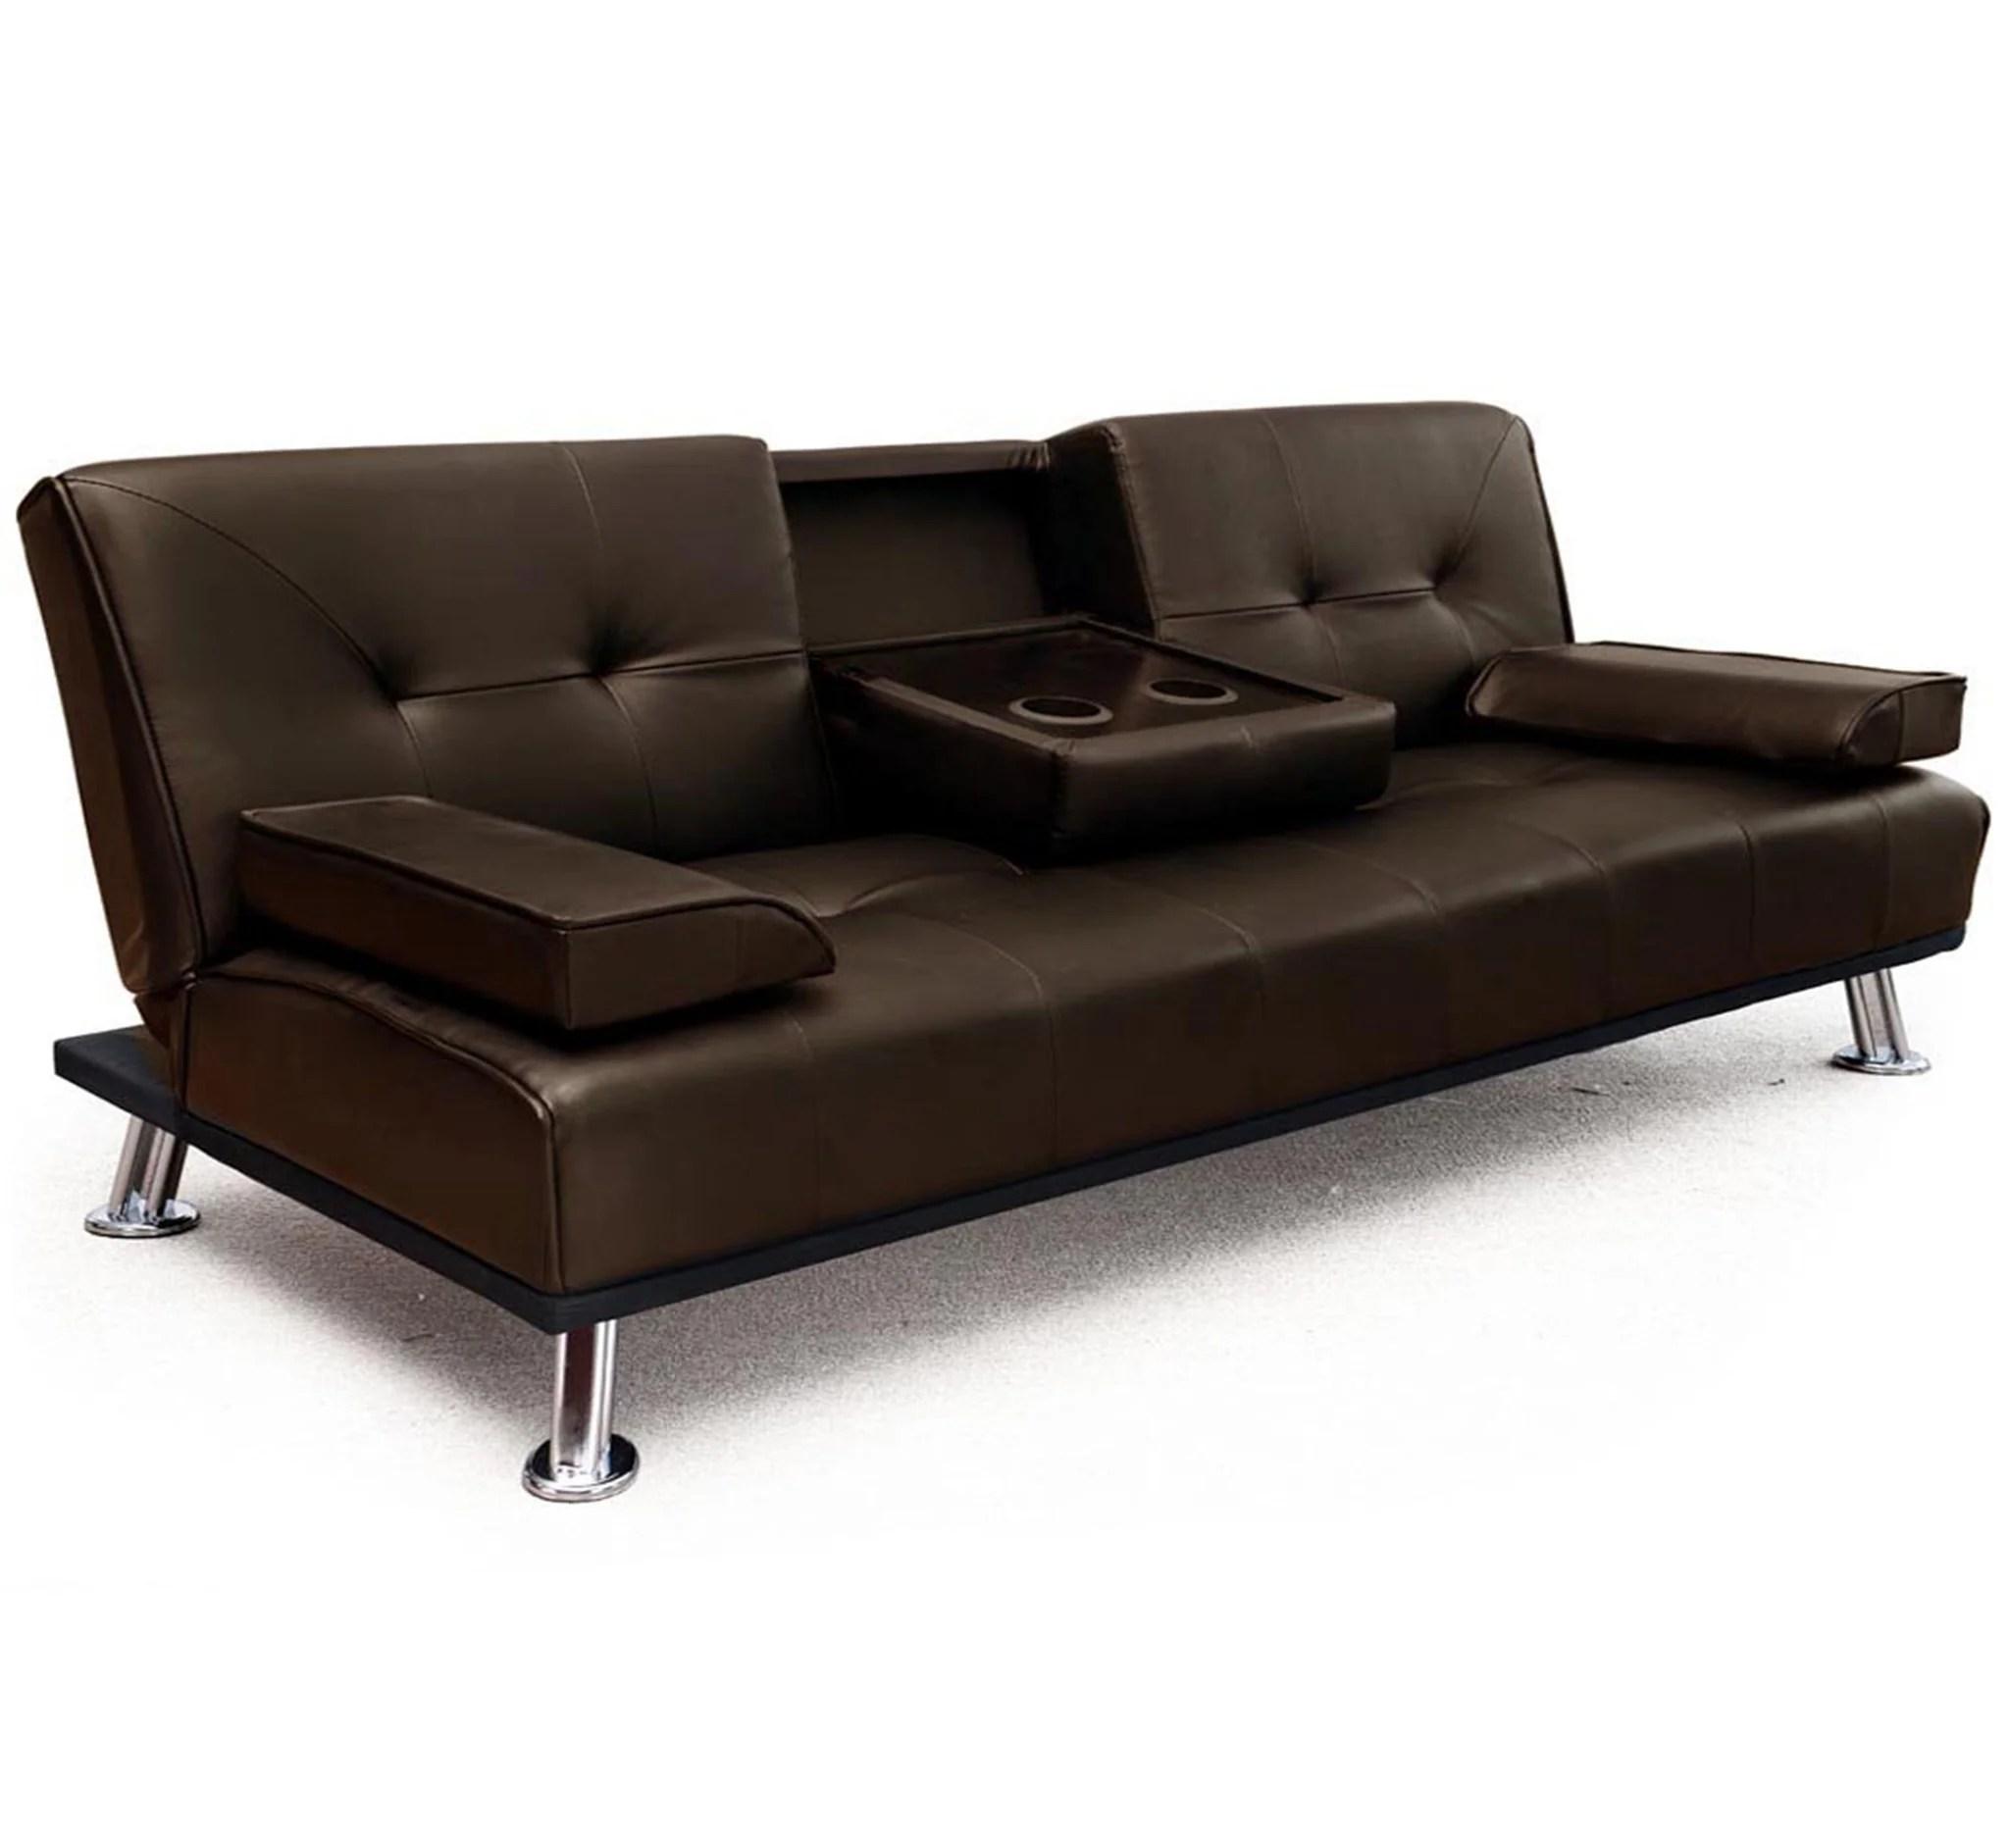 dhp allegra pillow top futon sofa bed como short roselawnlutheran